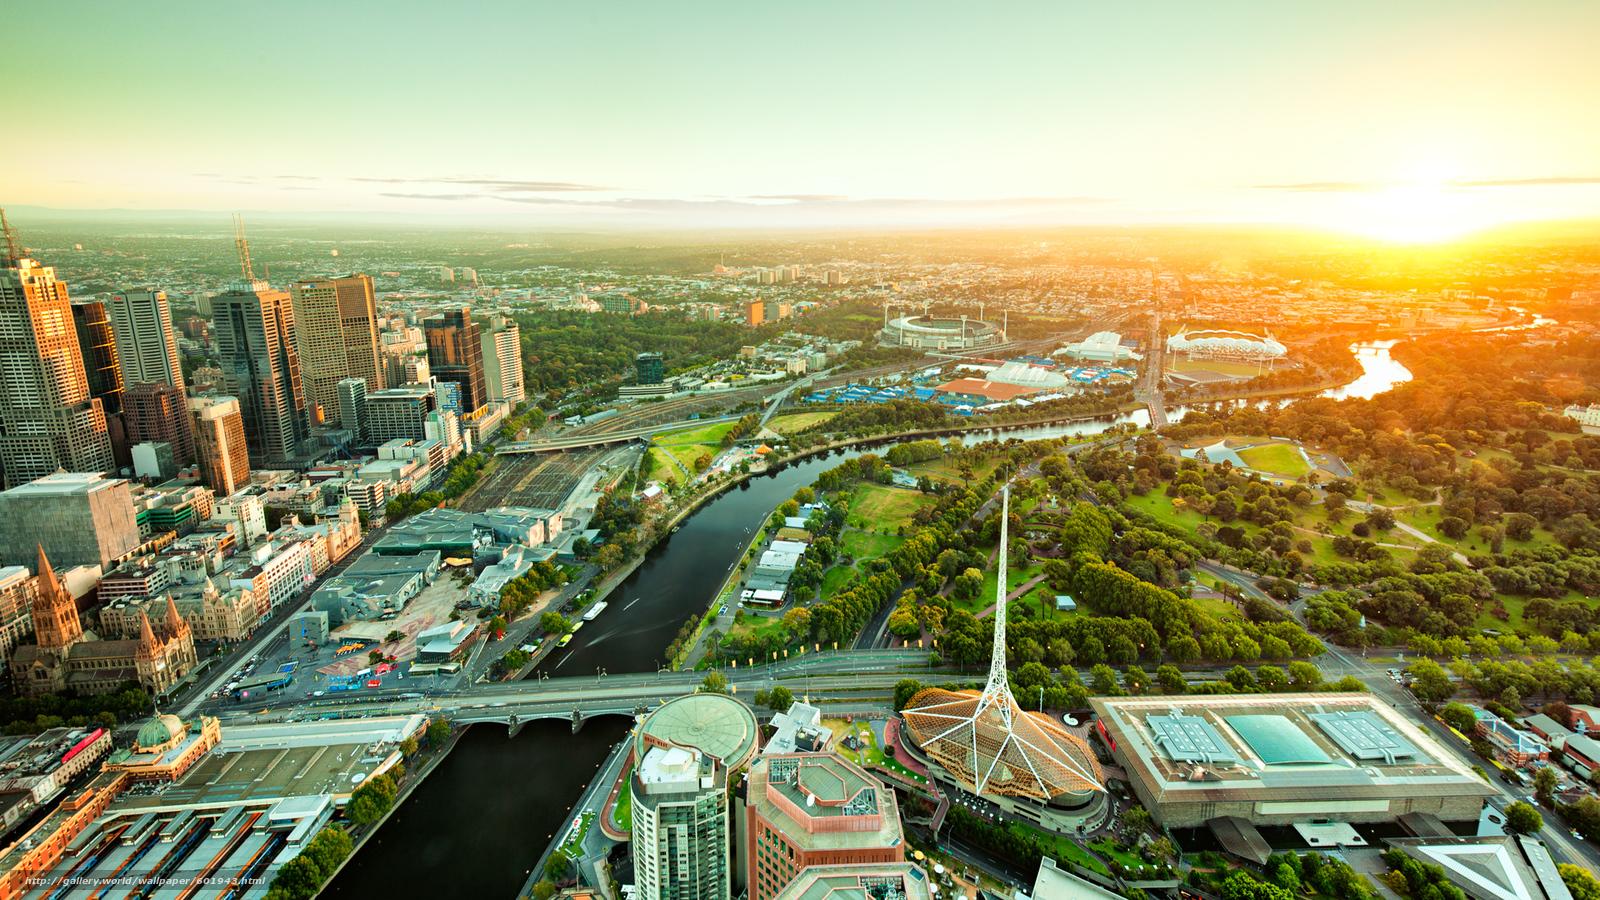 Wallpaper Melbourne Australia - The Wallpaper